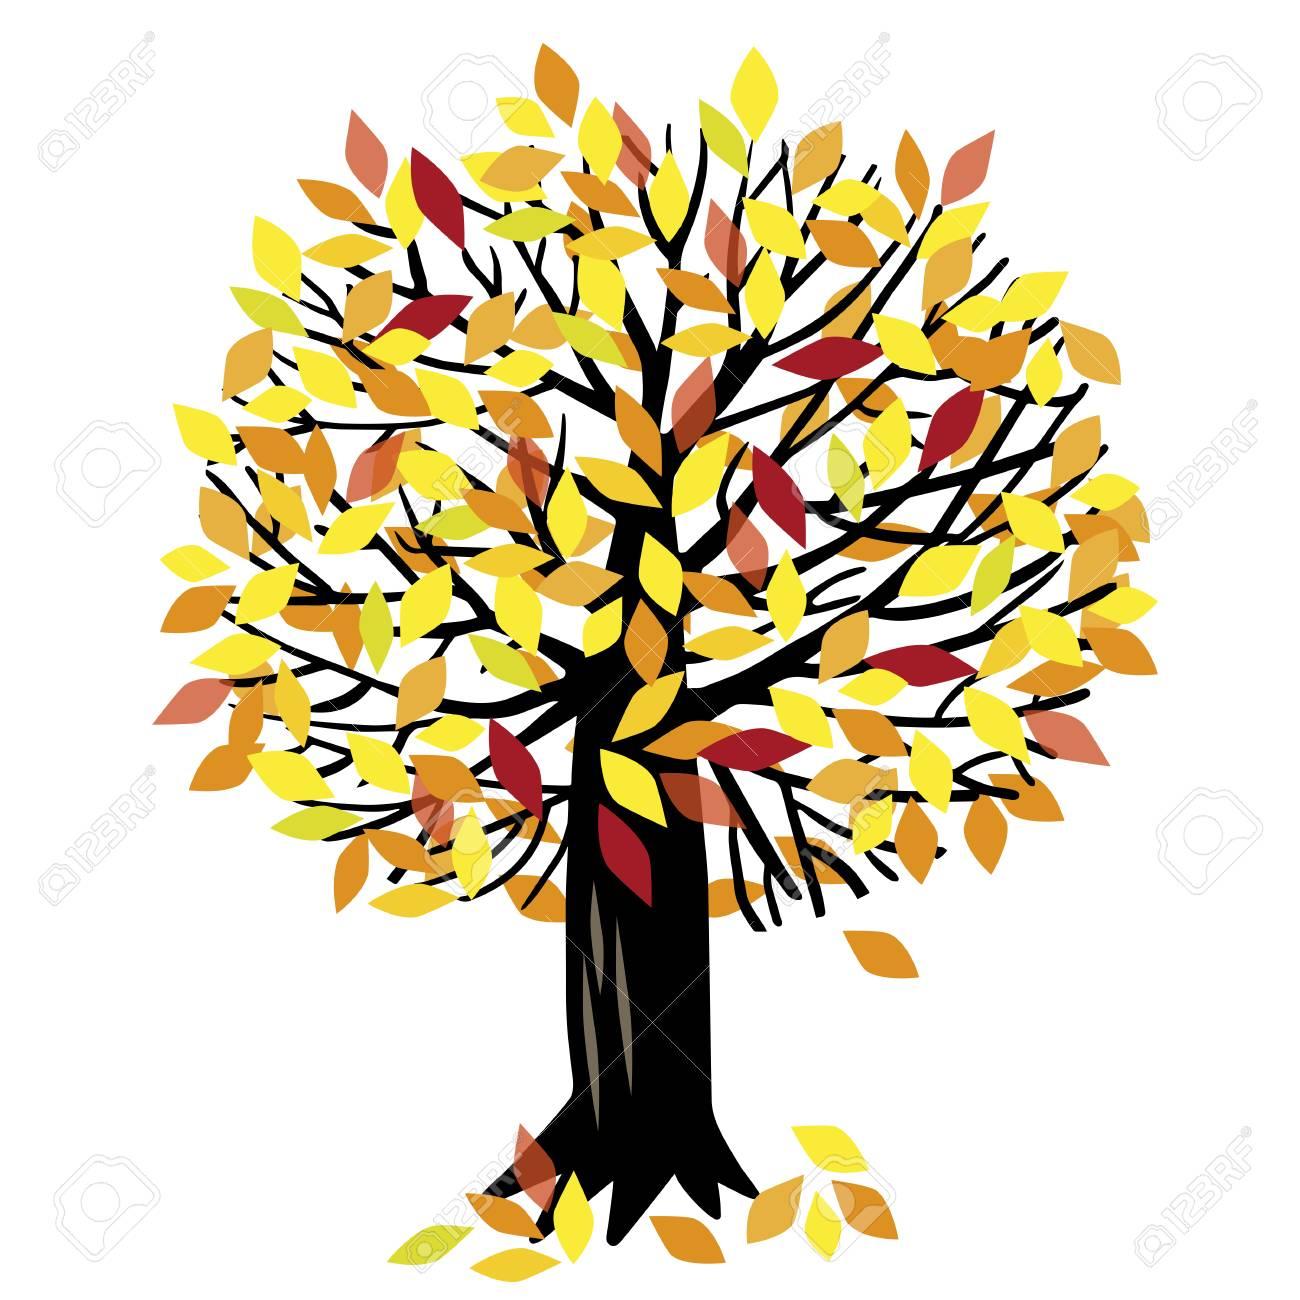 Vector illustration with autumn Apple tree or cherry tree.